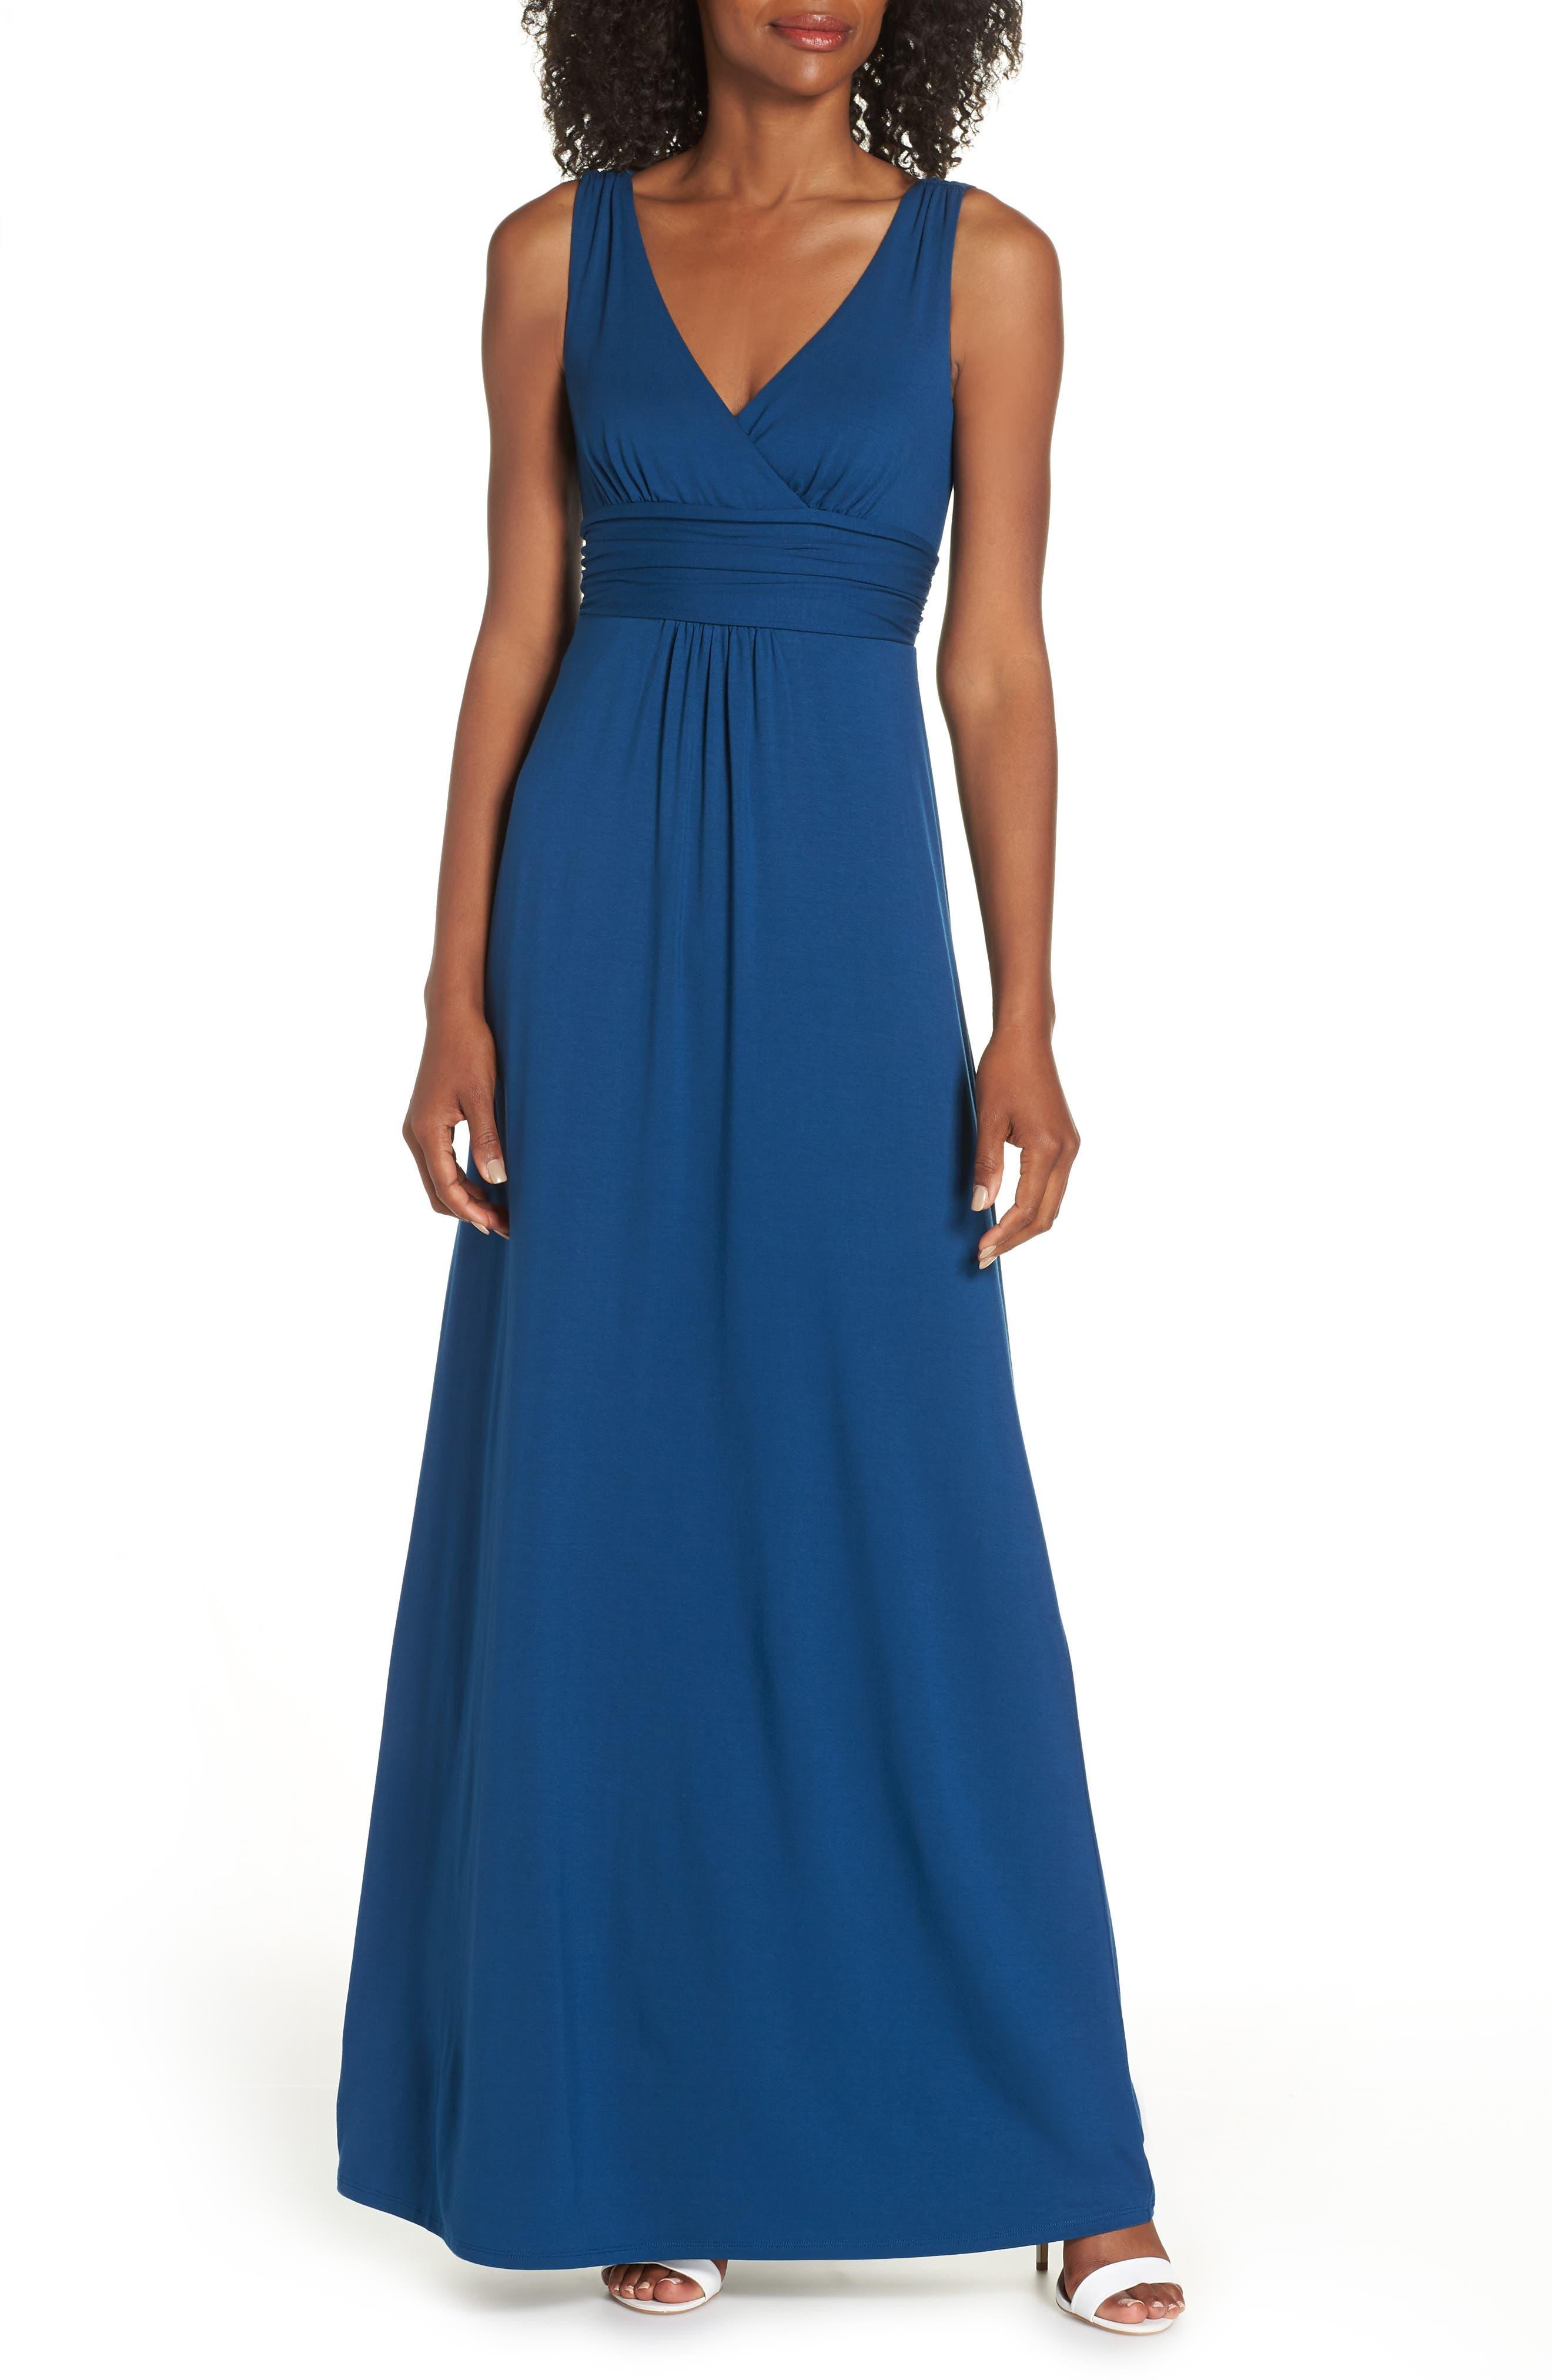 Lilly Pulitzer Sloane Maxi Dress, Blue